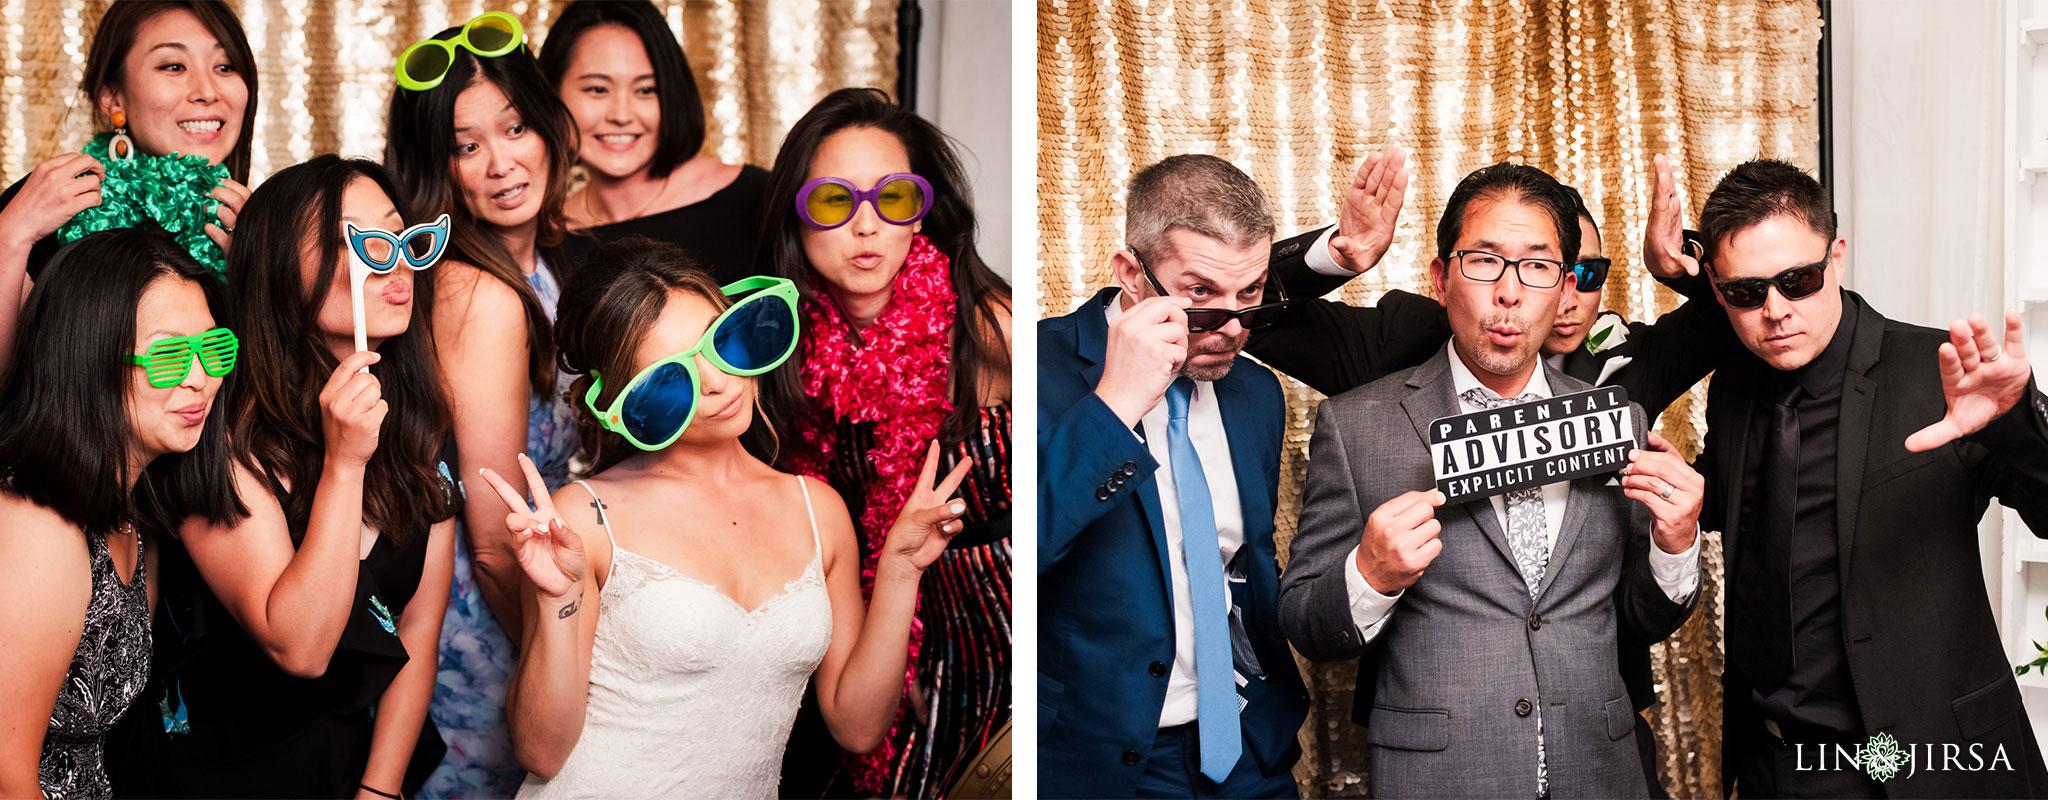 035 york manor los angeles wedding reception photography